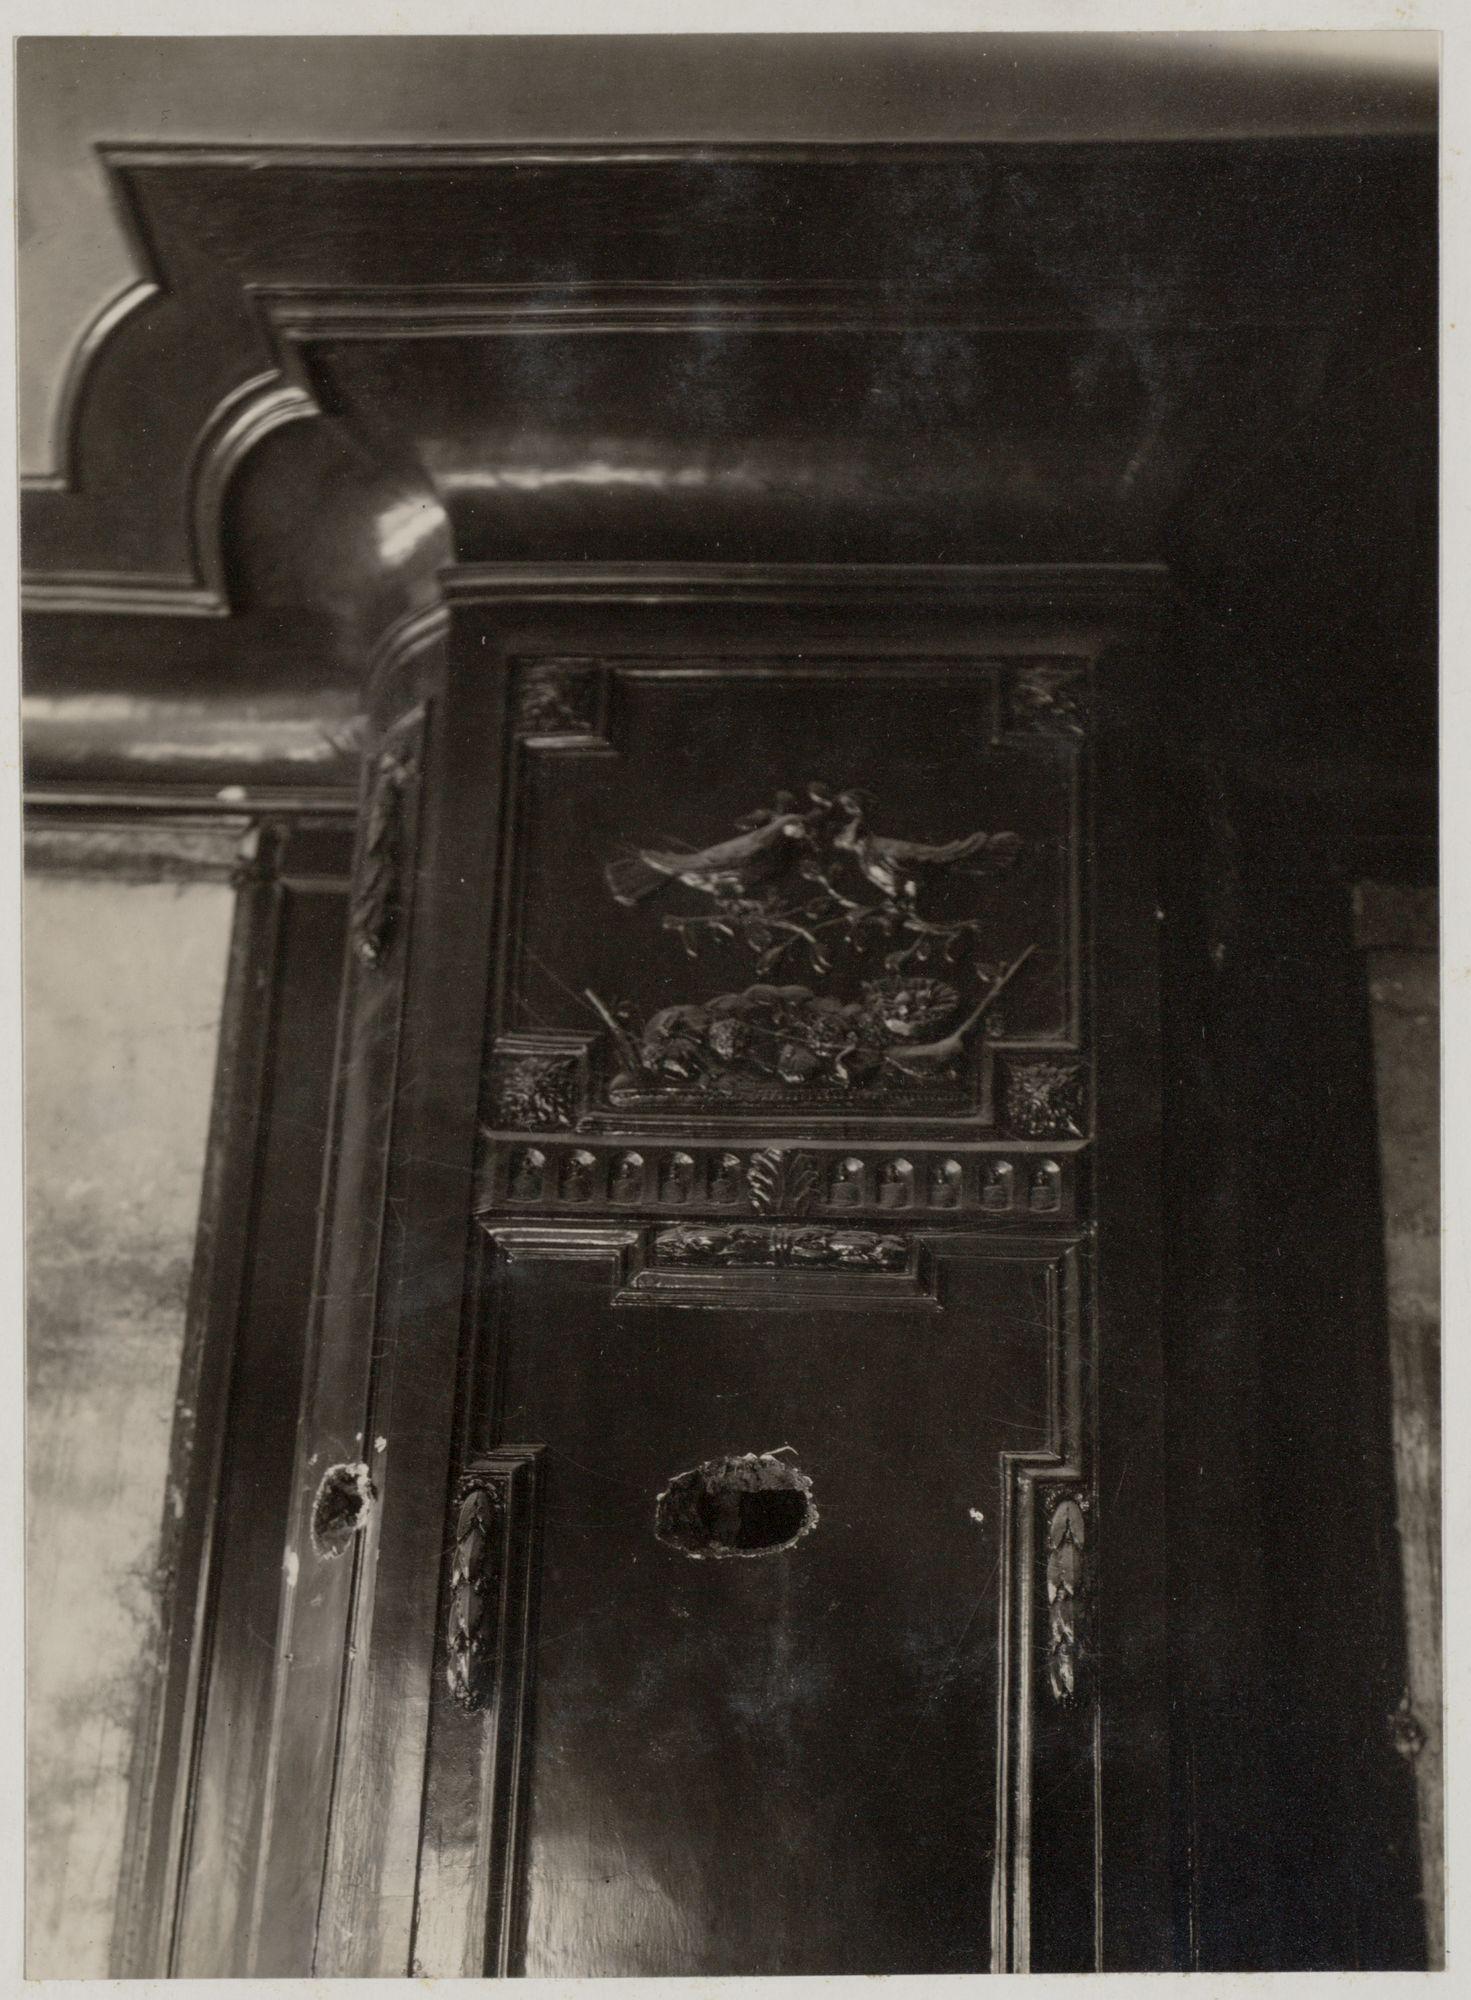 Gent: Kalandestraat: detail interieur